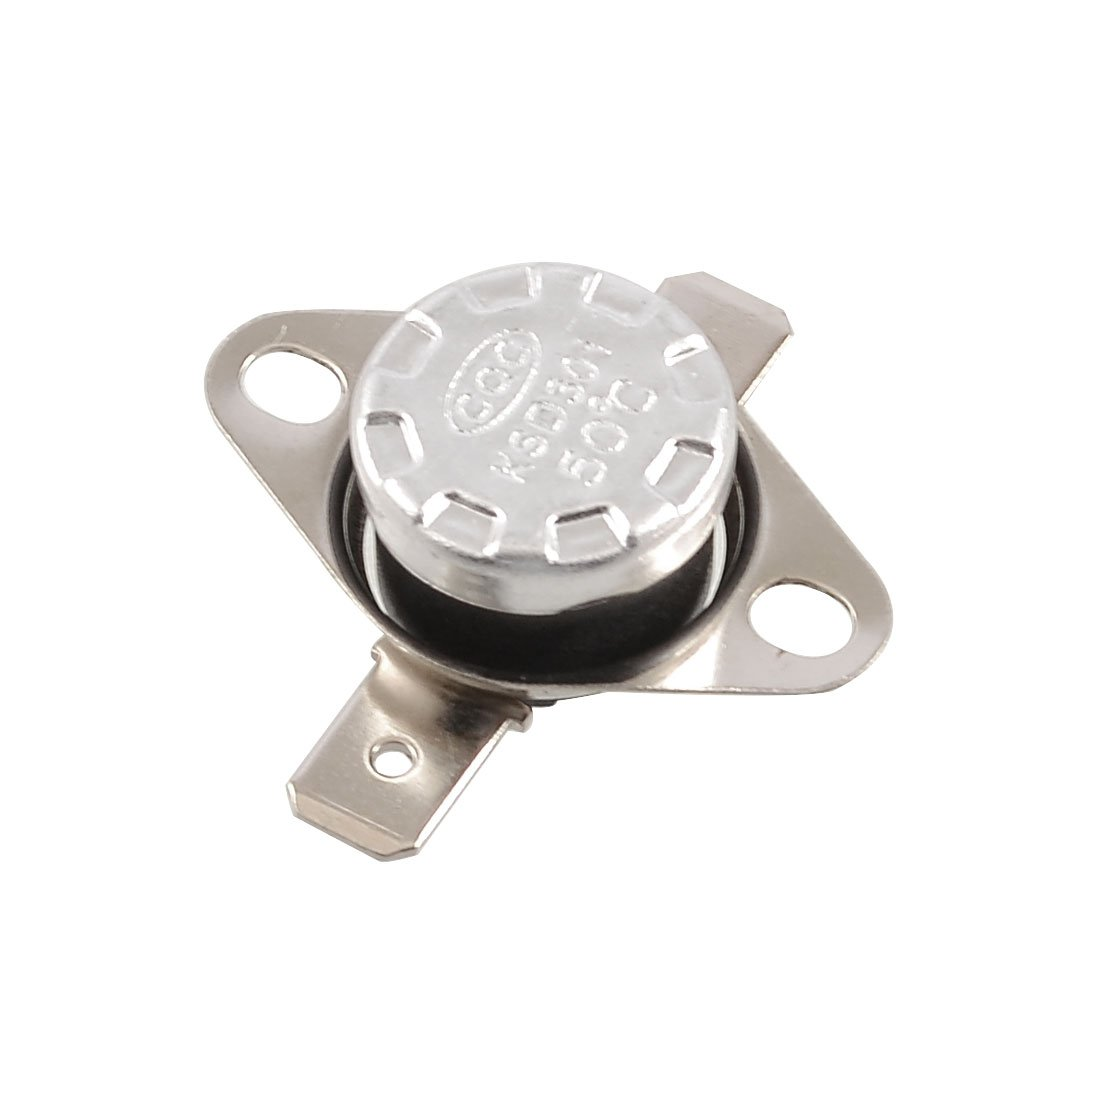 KSD301 50℃ 122°F Thermostat Normal Open NO Temperature Control Switch 10A 5pcs